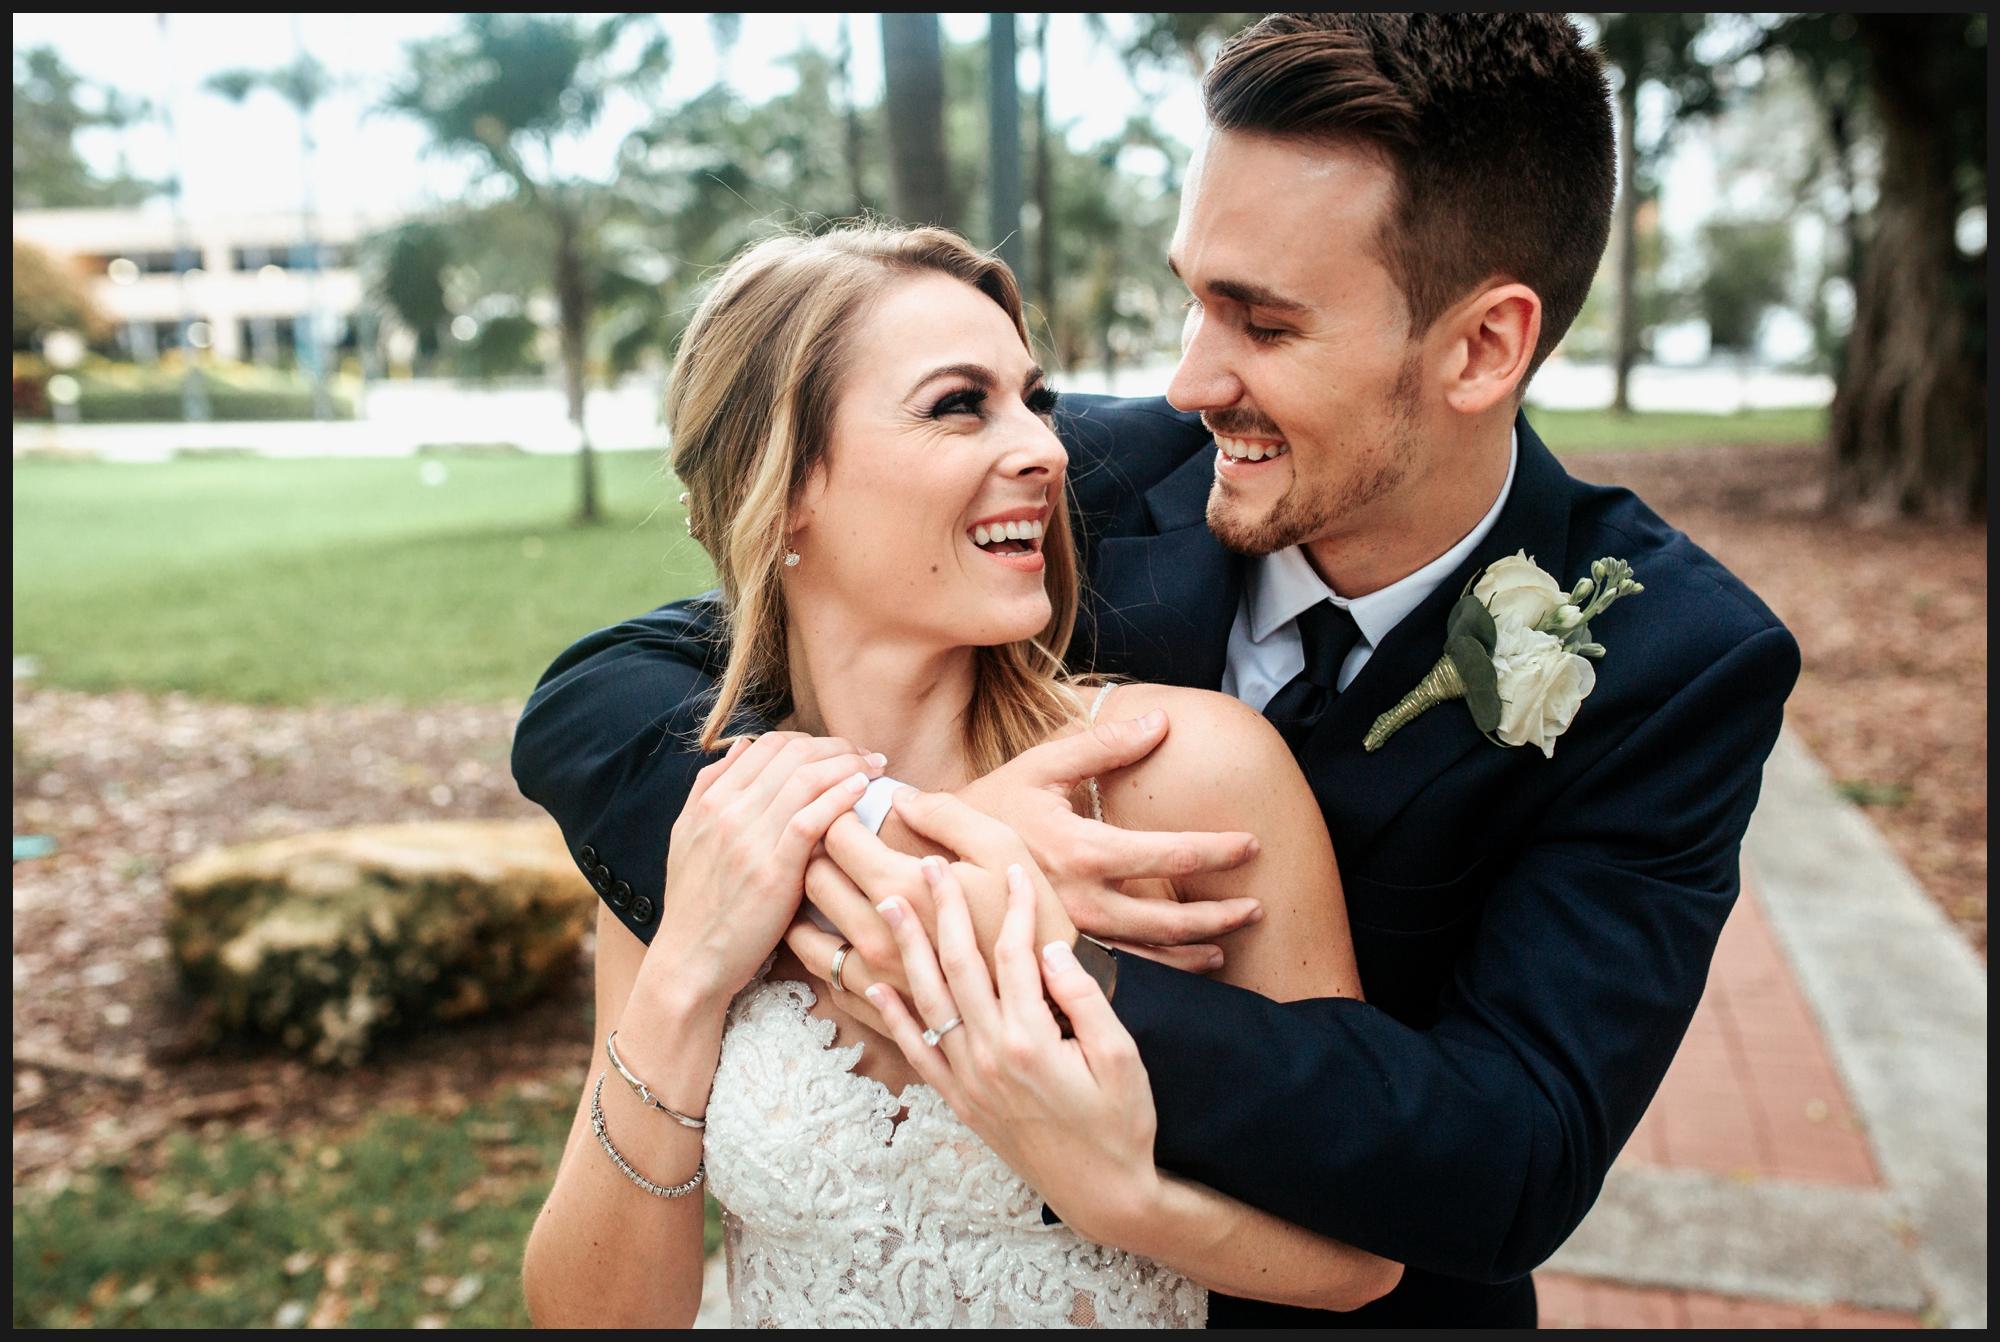 Orlando-Wedding-Photographer-destination-wedding-photographer-florida-wedding-photographer-bohemian-wedding-photographer_0097.jpg